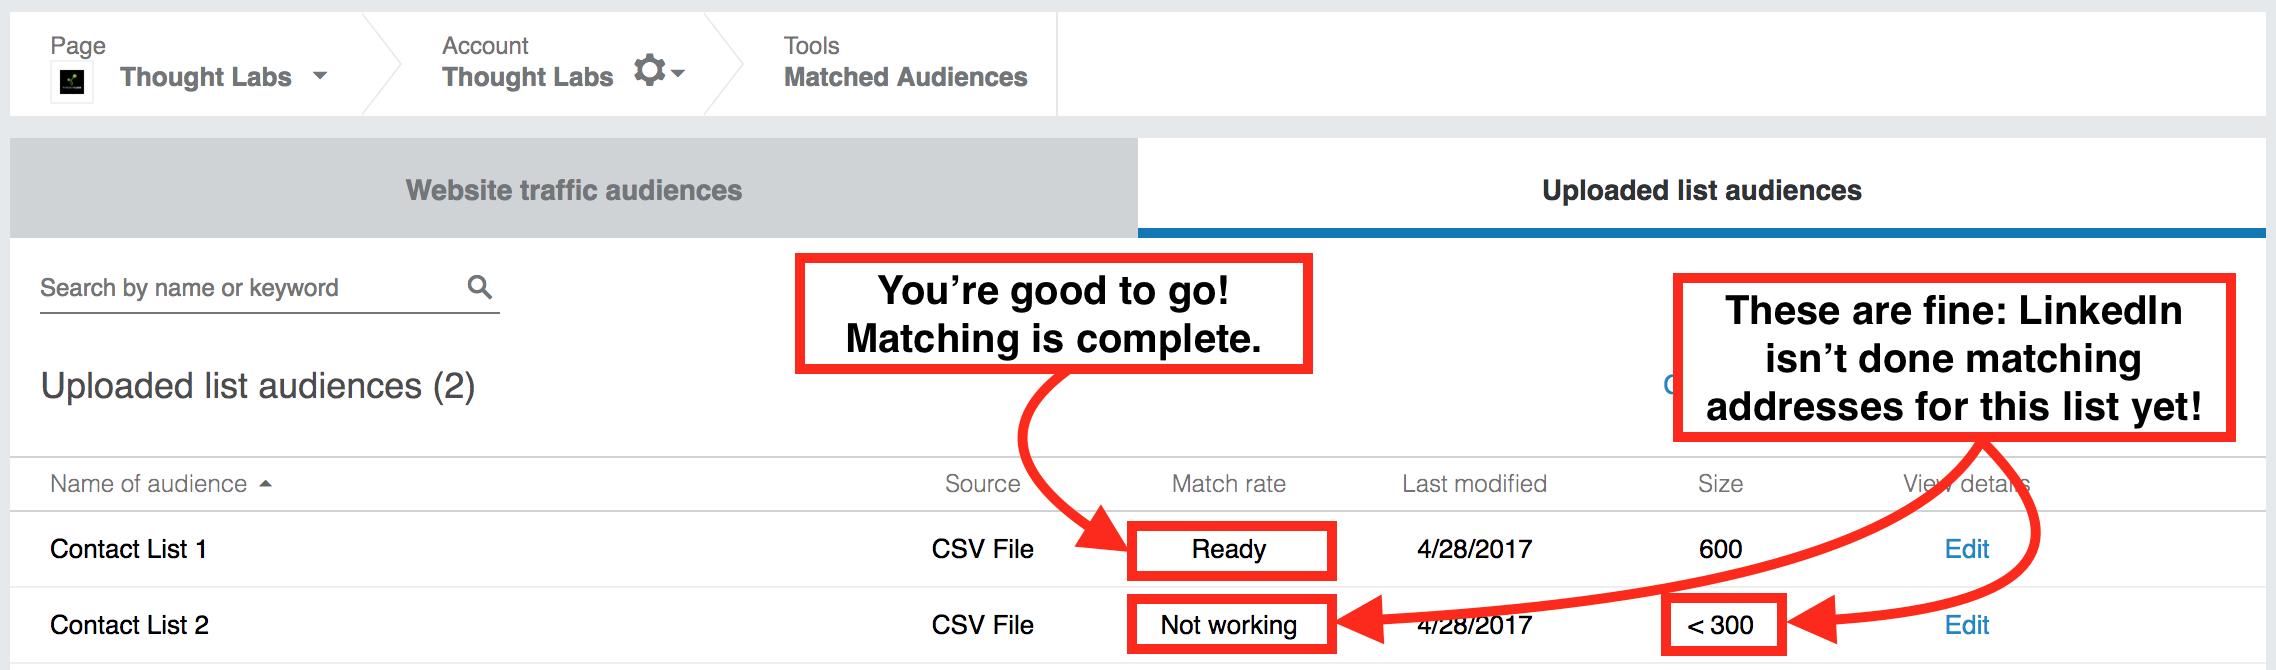 LinkedIn matched audience verification list